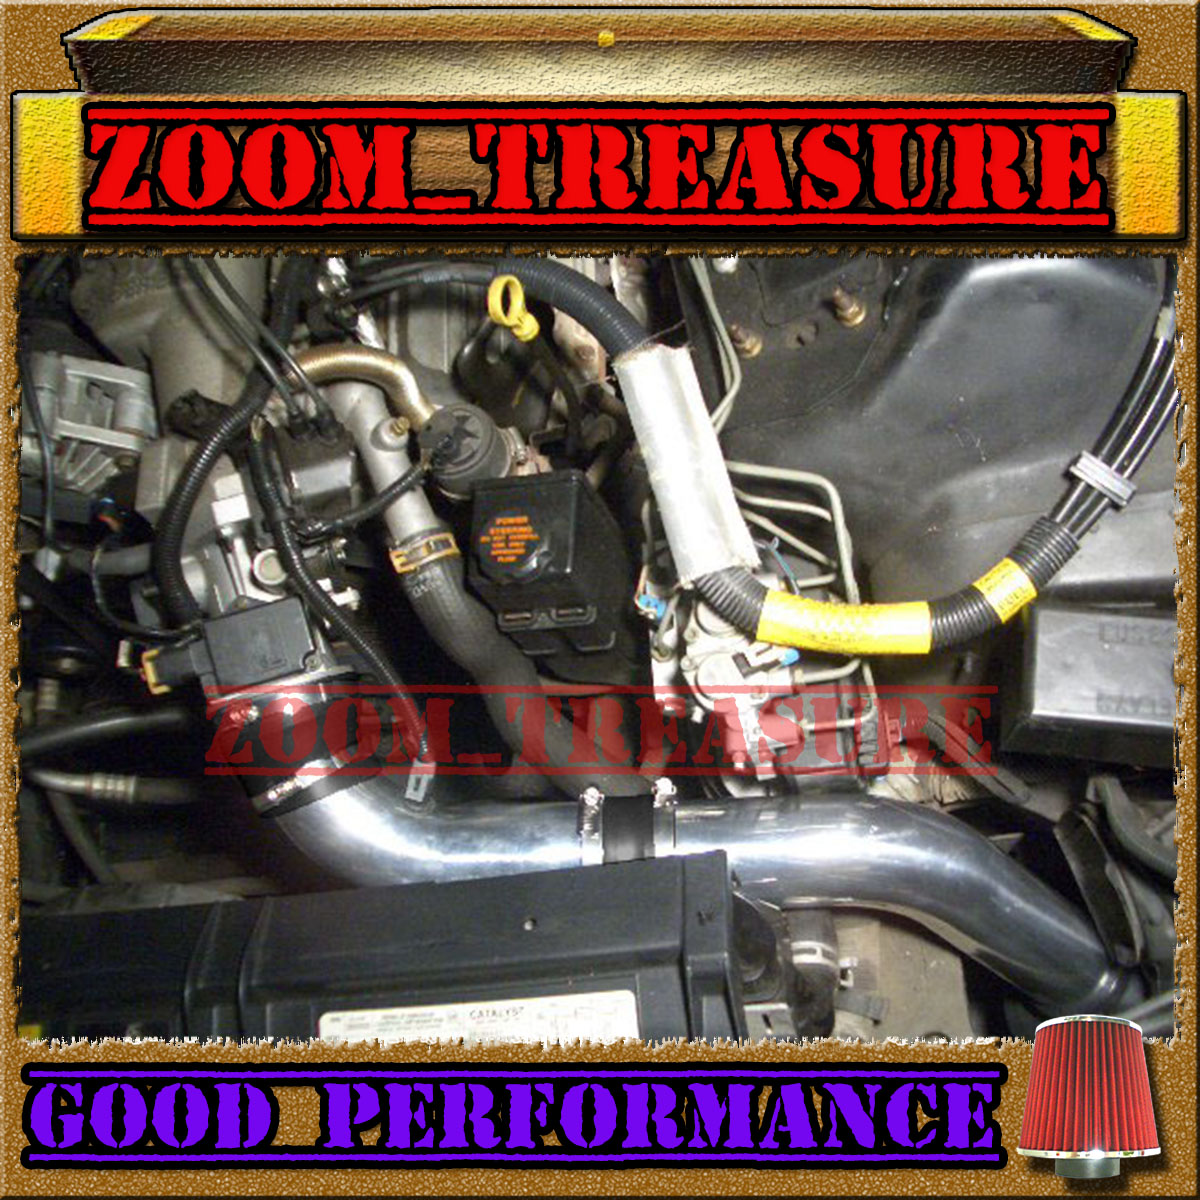 Gm Performance Air Intake Elbow Rubber Black Chevy Small: BLACK RED 1995-1997 CHEVY CAMARO/PONTIAC FIREBIRD V6 FULL